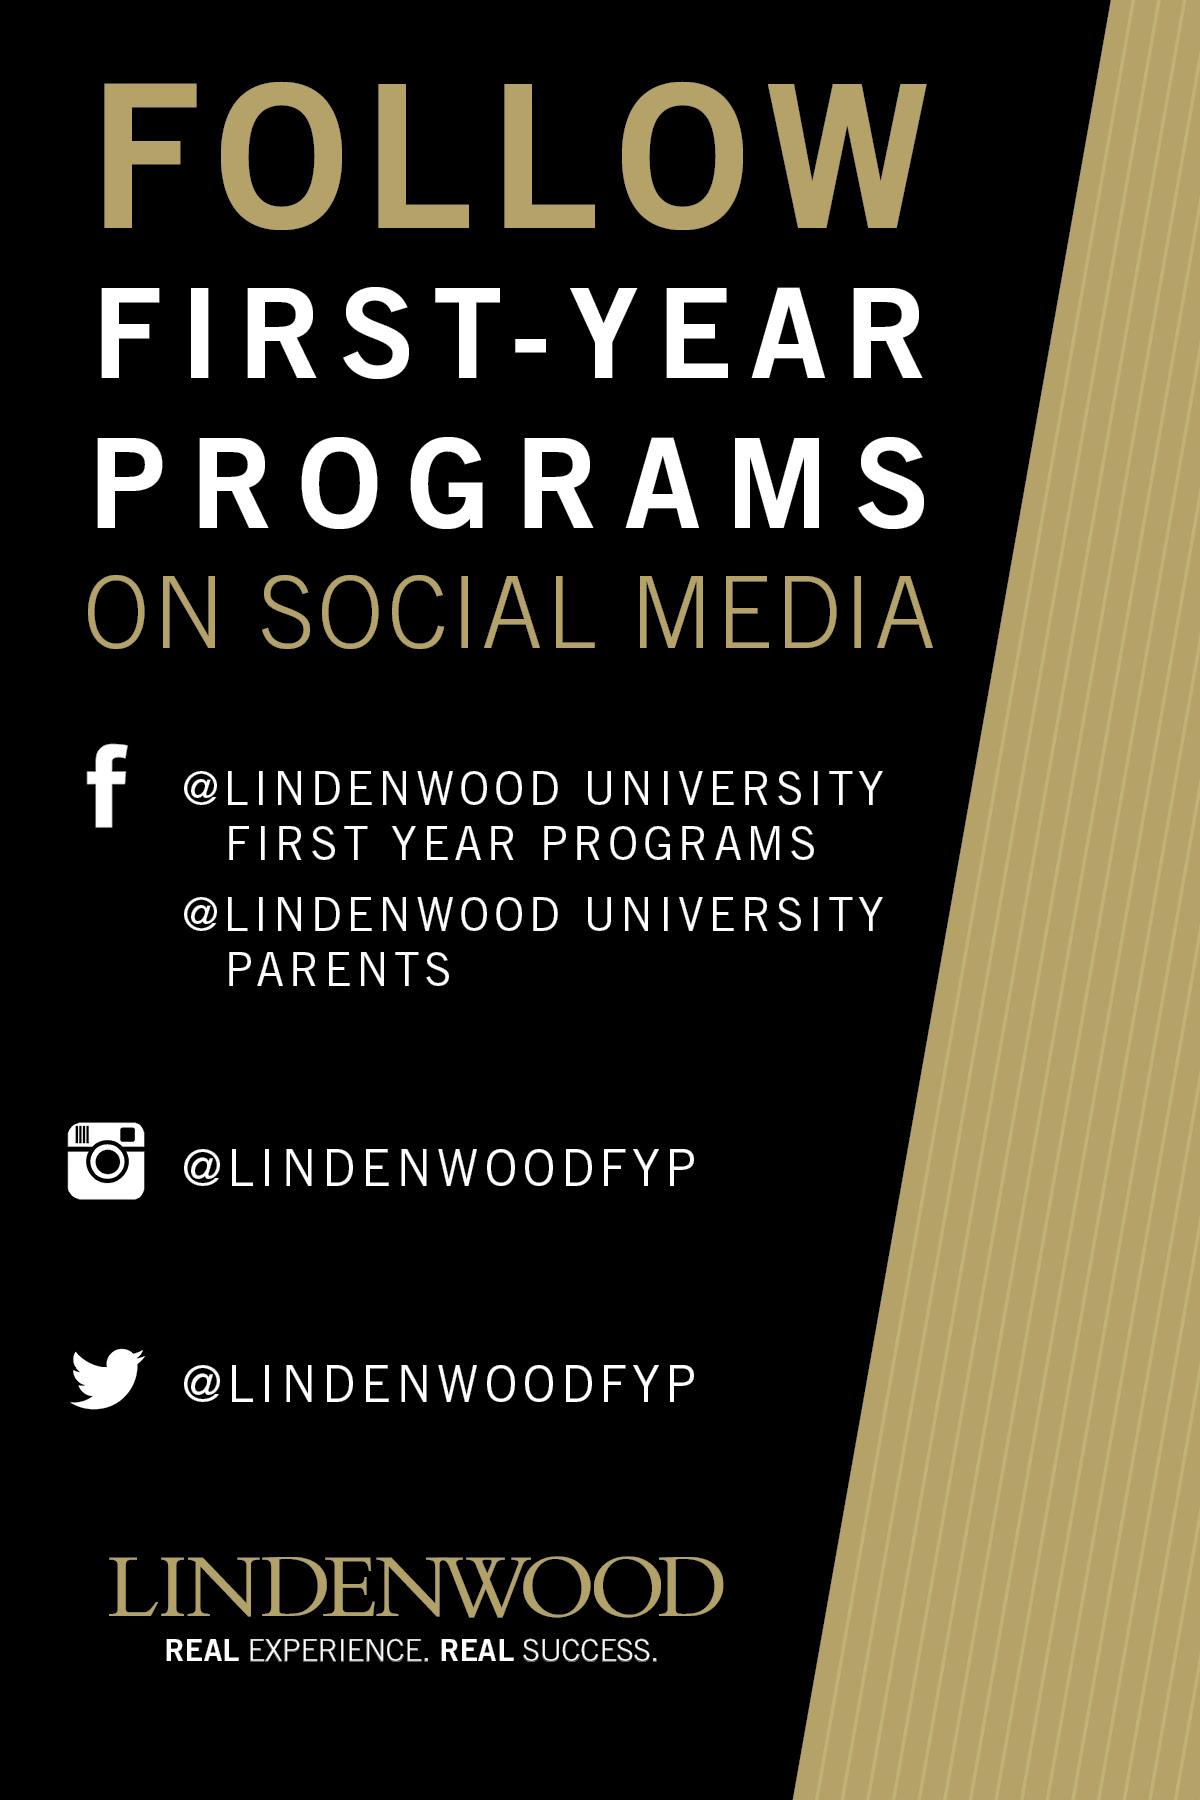 First Year Programs - Social Media Handout